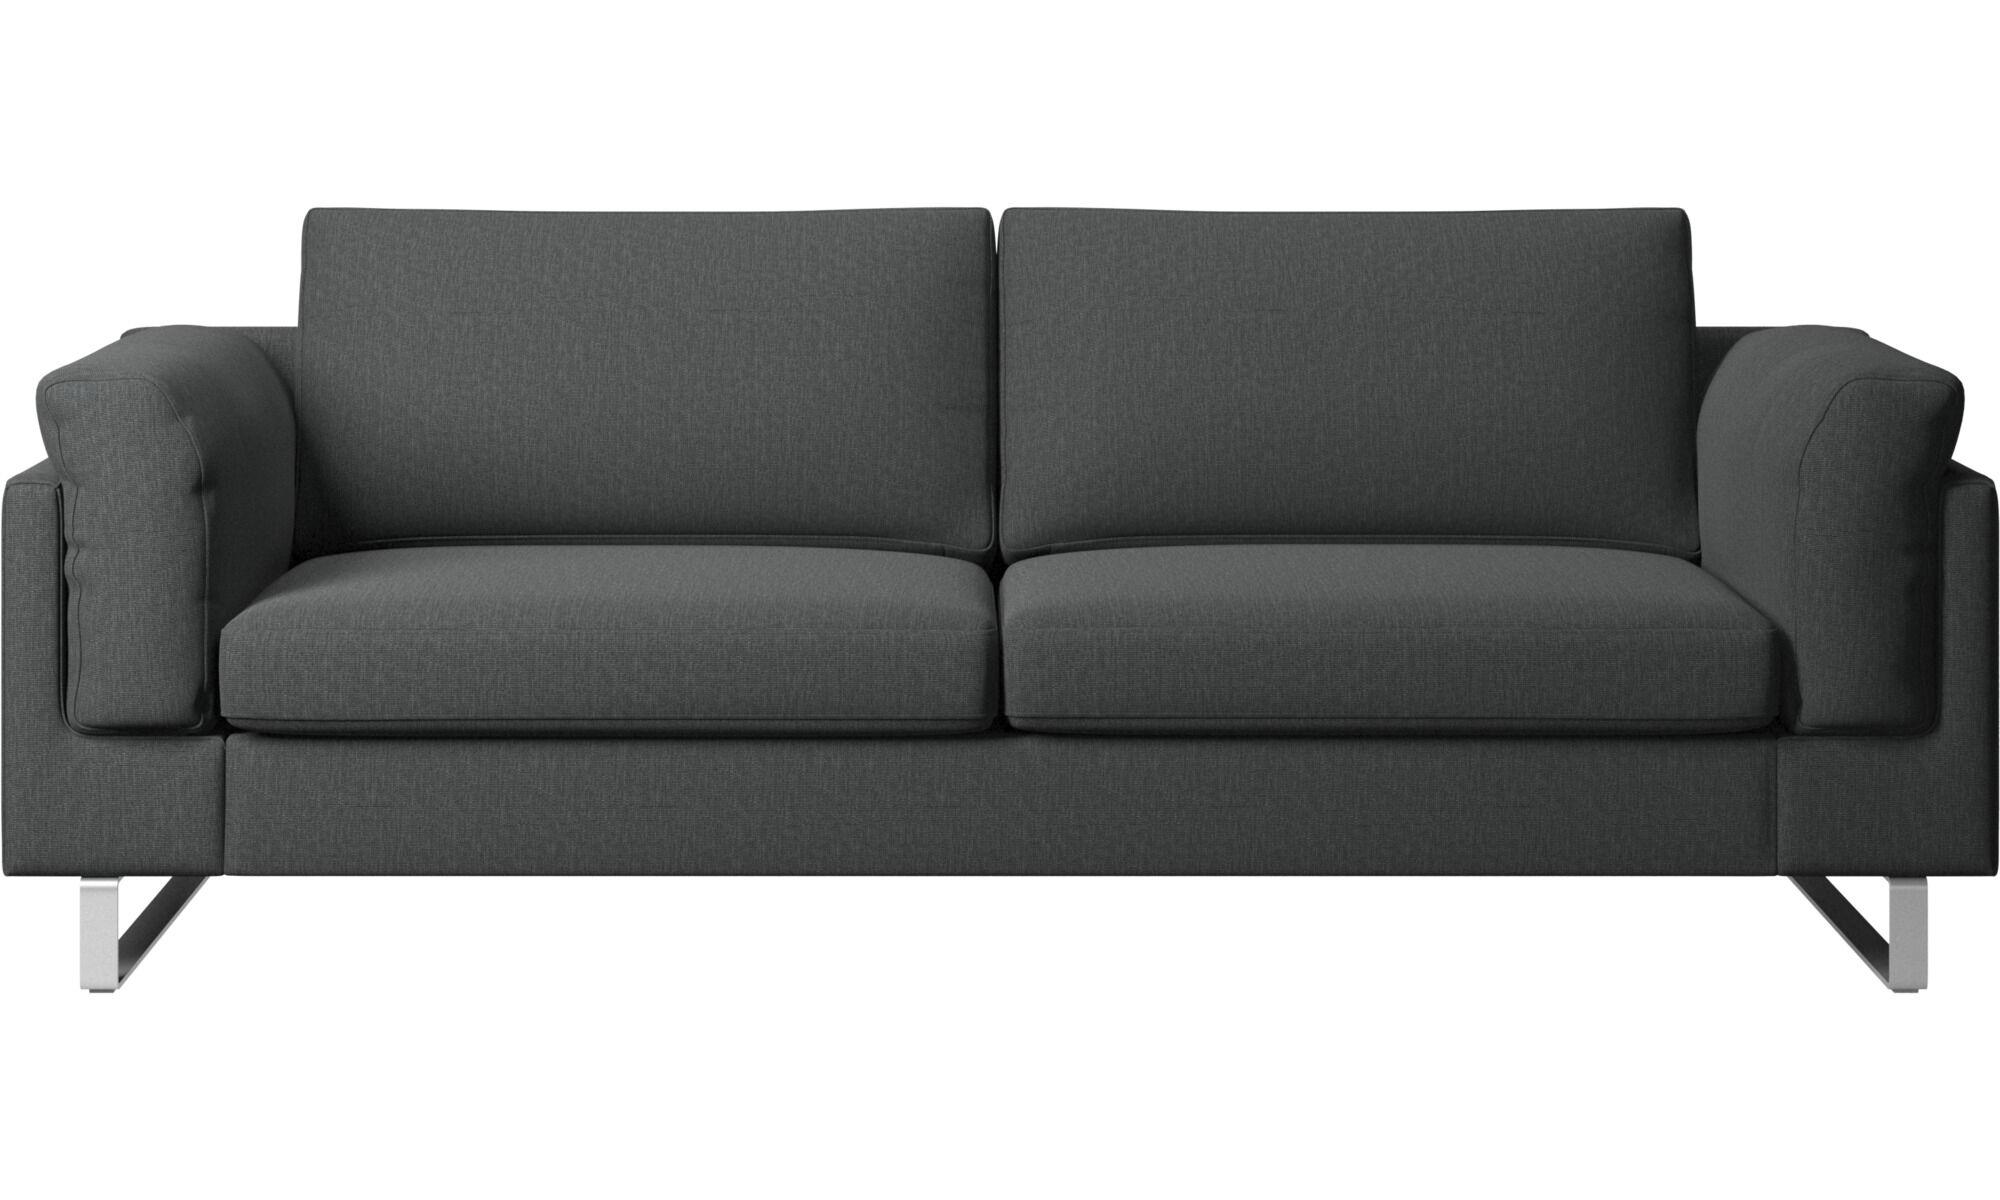 2.5 Seater Sofas   Indivi 2 Sofa   Gray   Fabric